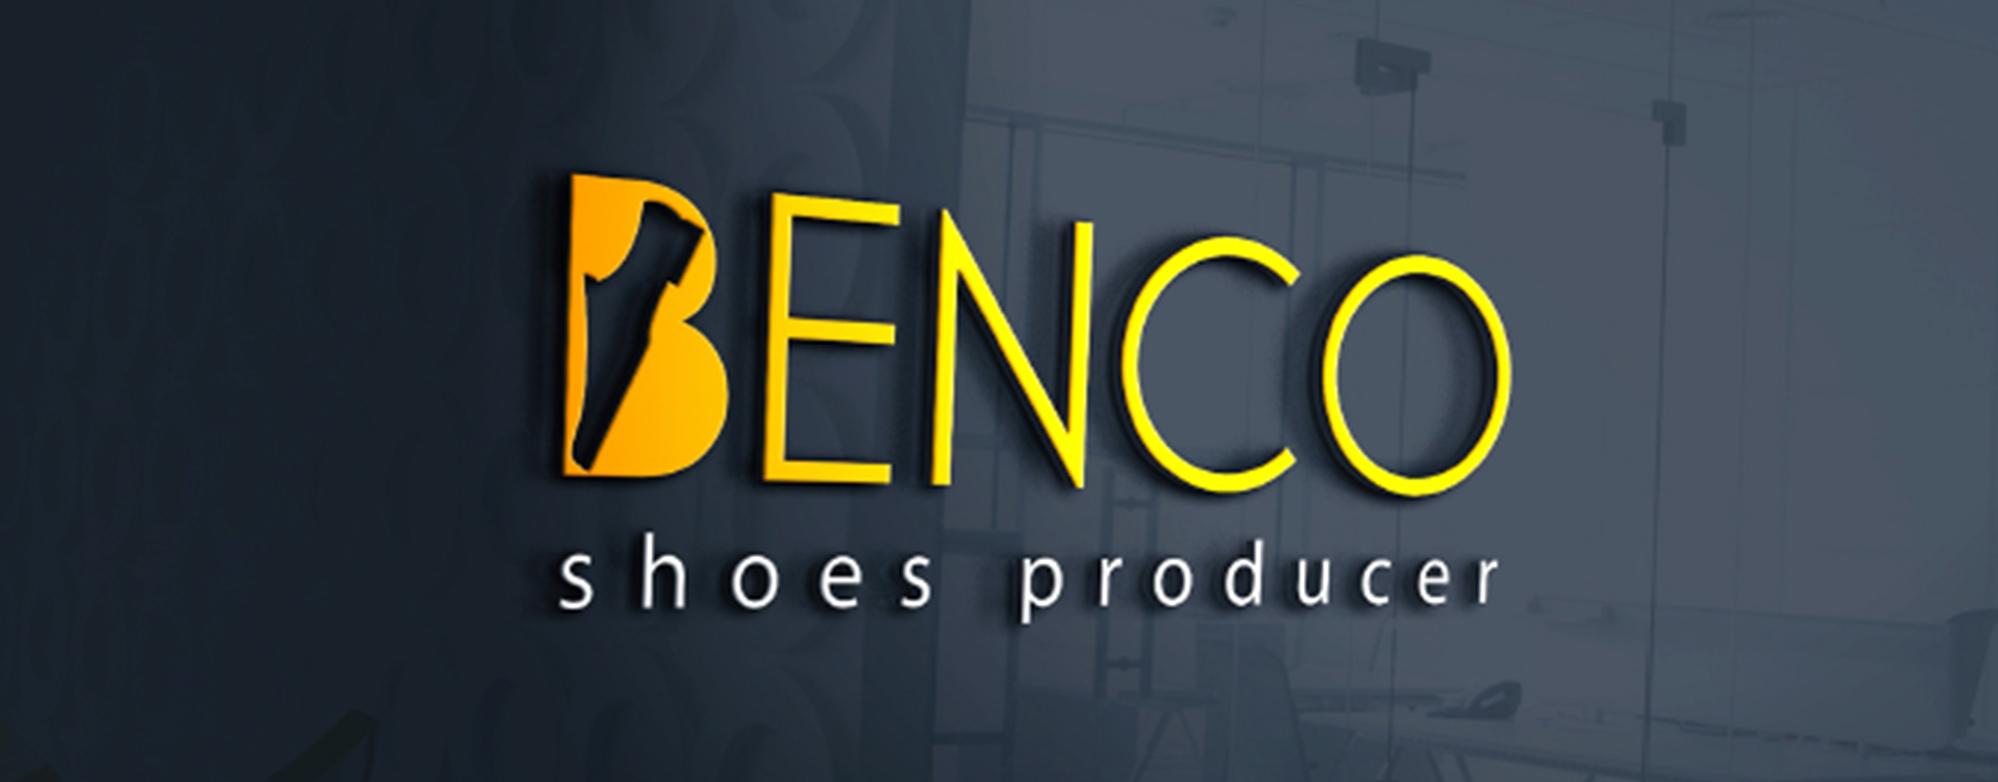 کفش بنکو (کفش benco)